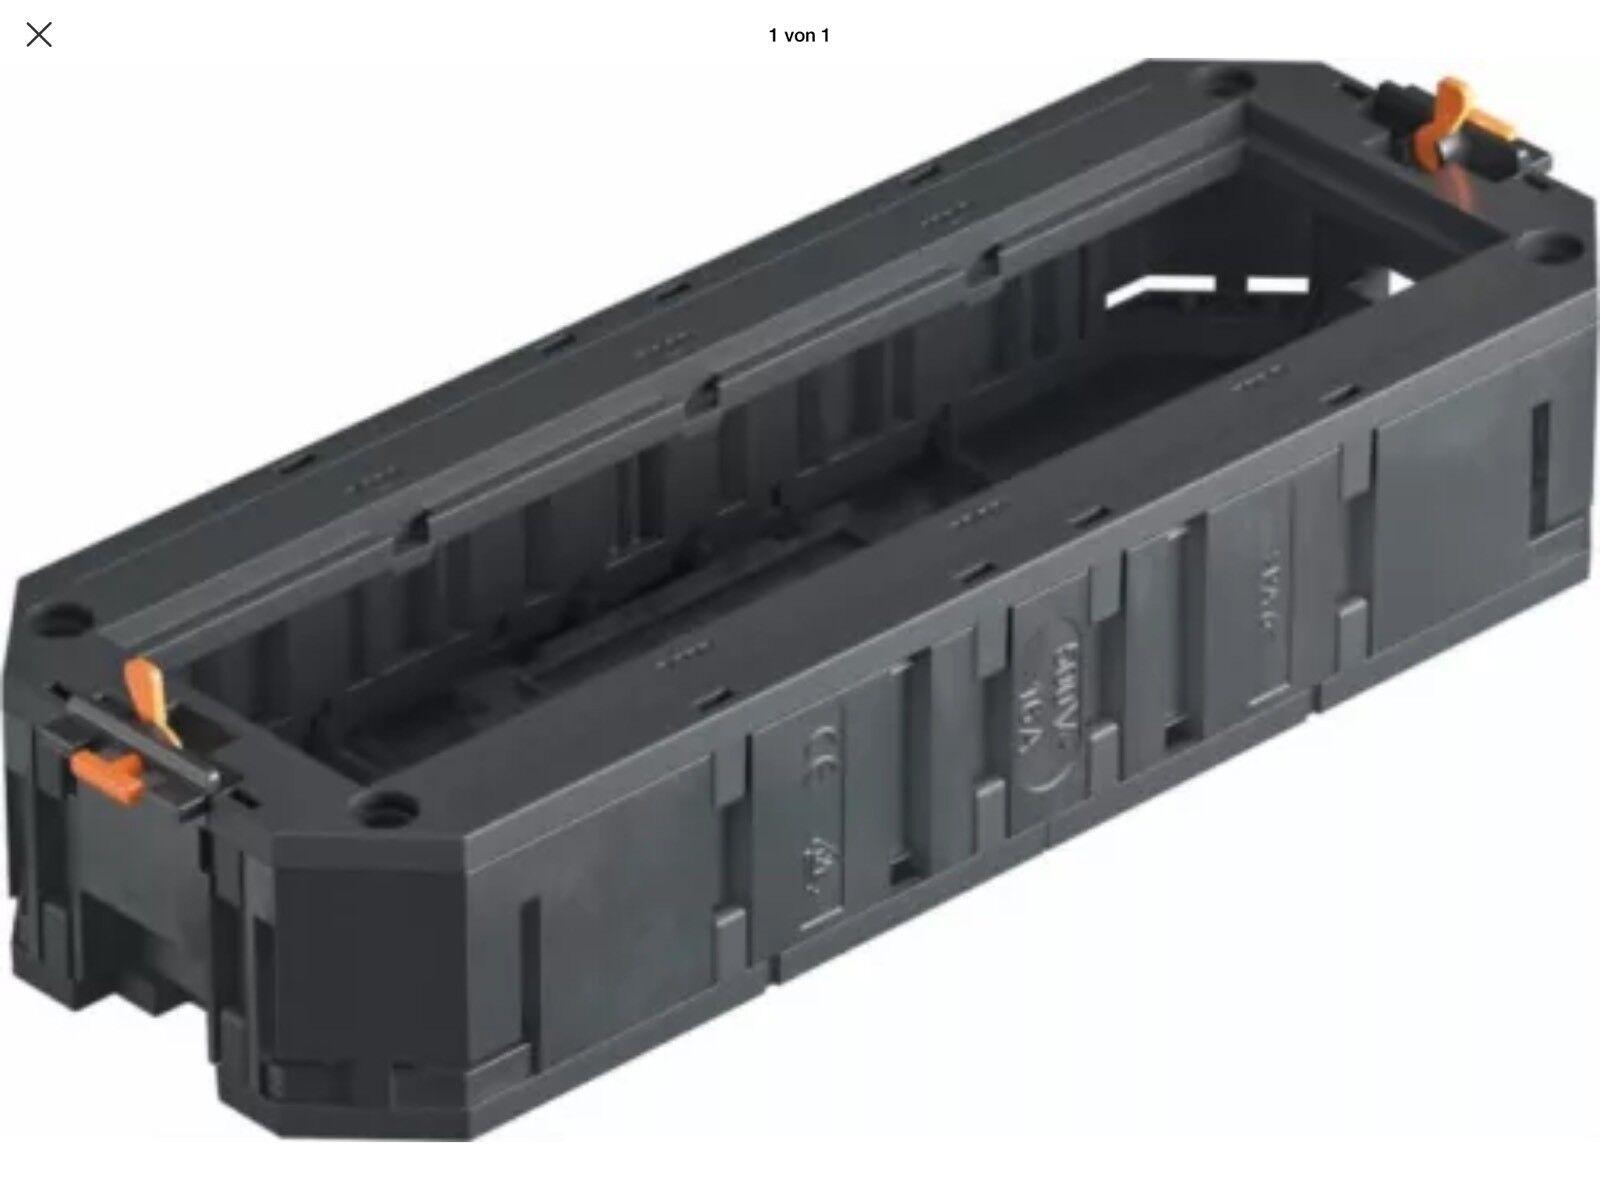 10x OBO Bettermann Grünr Grünr Grünr Universalträger für 4 Modul45-Geräte UT4 45 4 | Meistverkaufte weltweit  229010